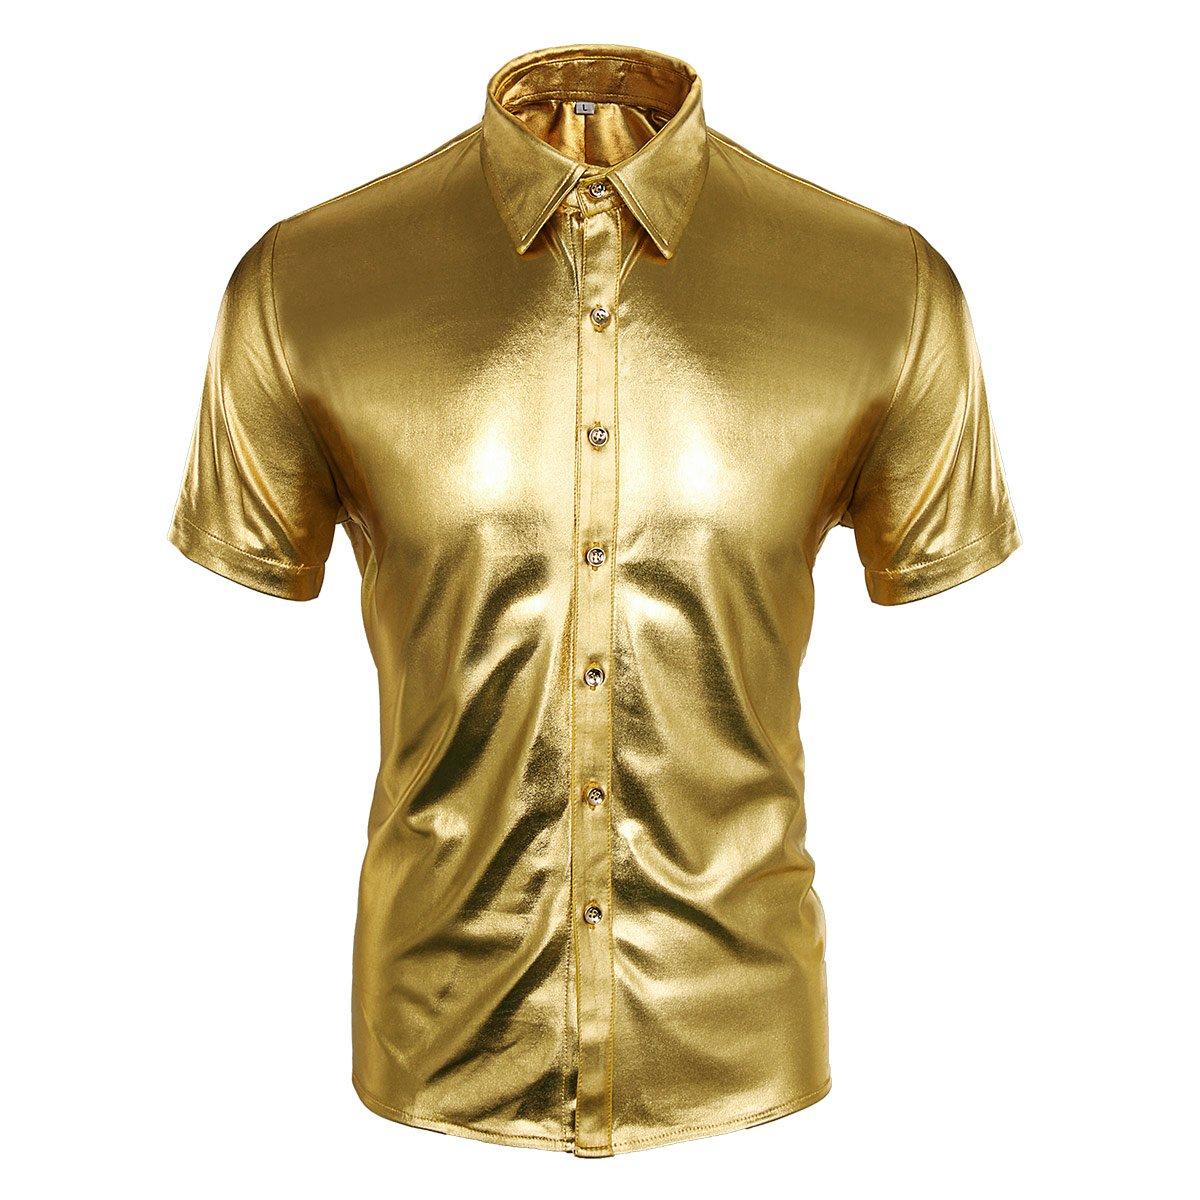 Mens Metallic Shiny Long Sleeve Shirt Grandad Collar Tops Party Show Dance